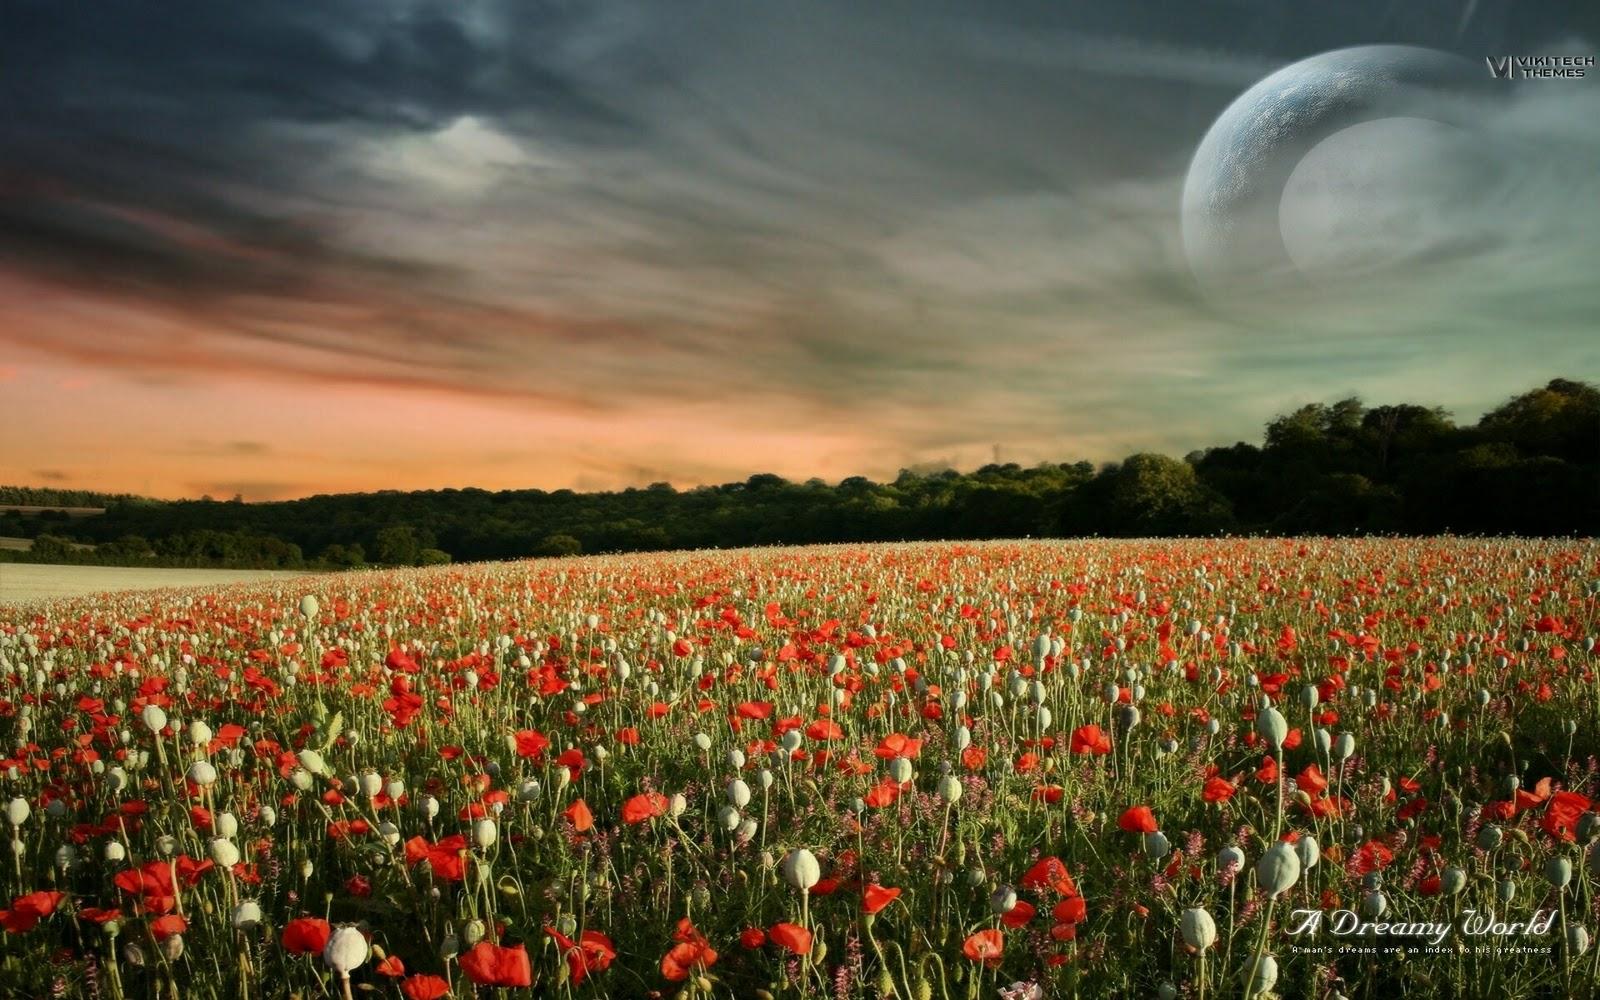 Paisajes y planetas imagenes hd elegantes wallpapers 32 - Windows 8 1 wallpaper hd nature ...